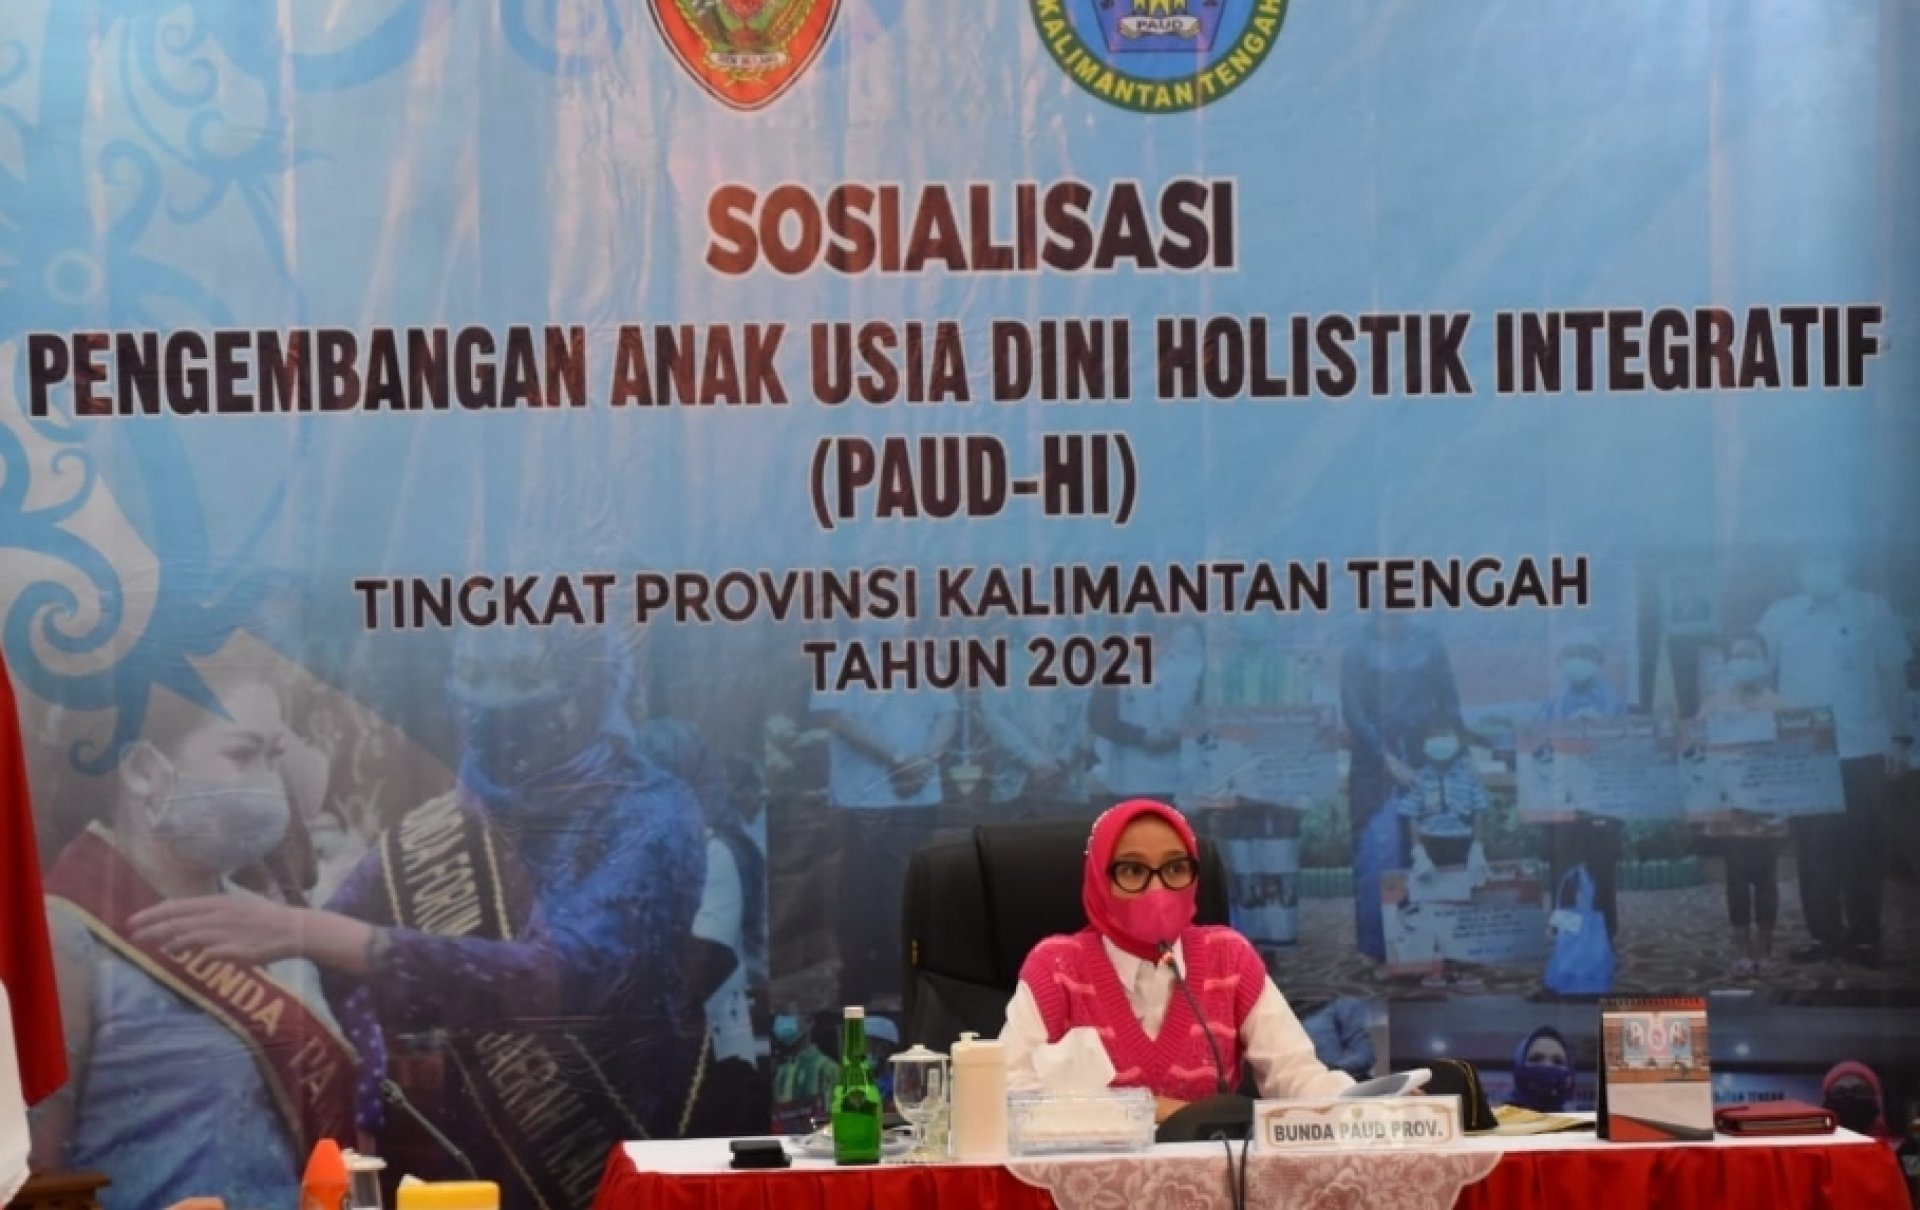 Setda Prov Kalteng Bunda Paud Kalteng Buka Kegiatan Sosialisasi Pengembangan Program Paud Holistik Integratif